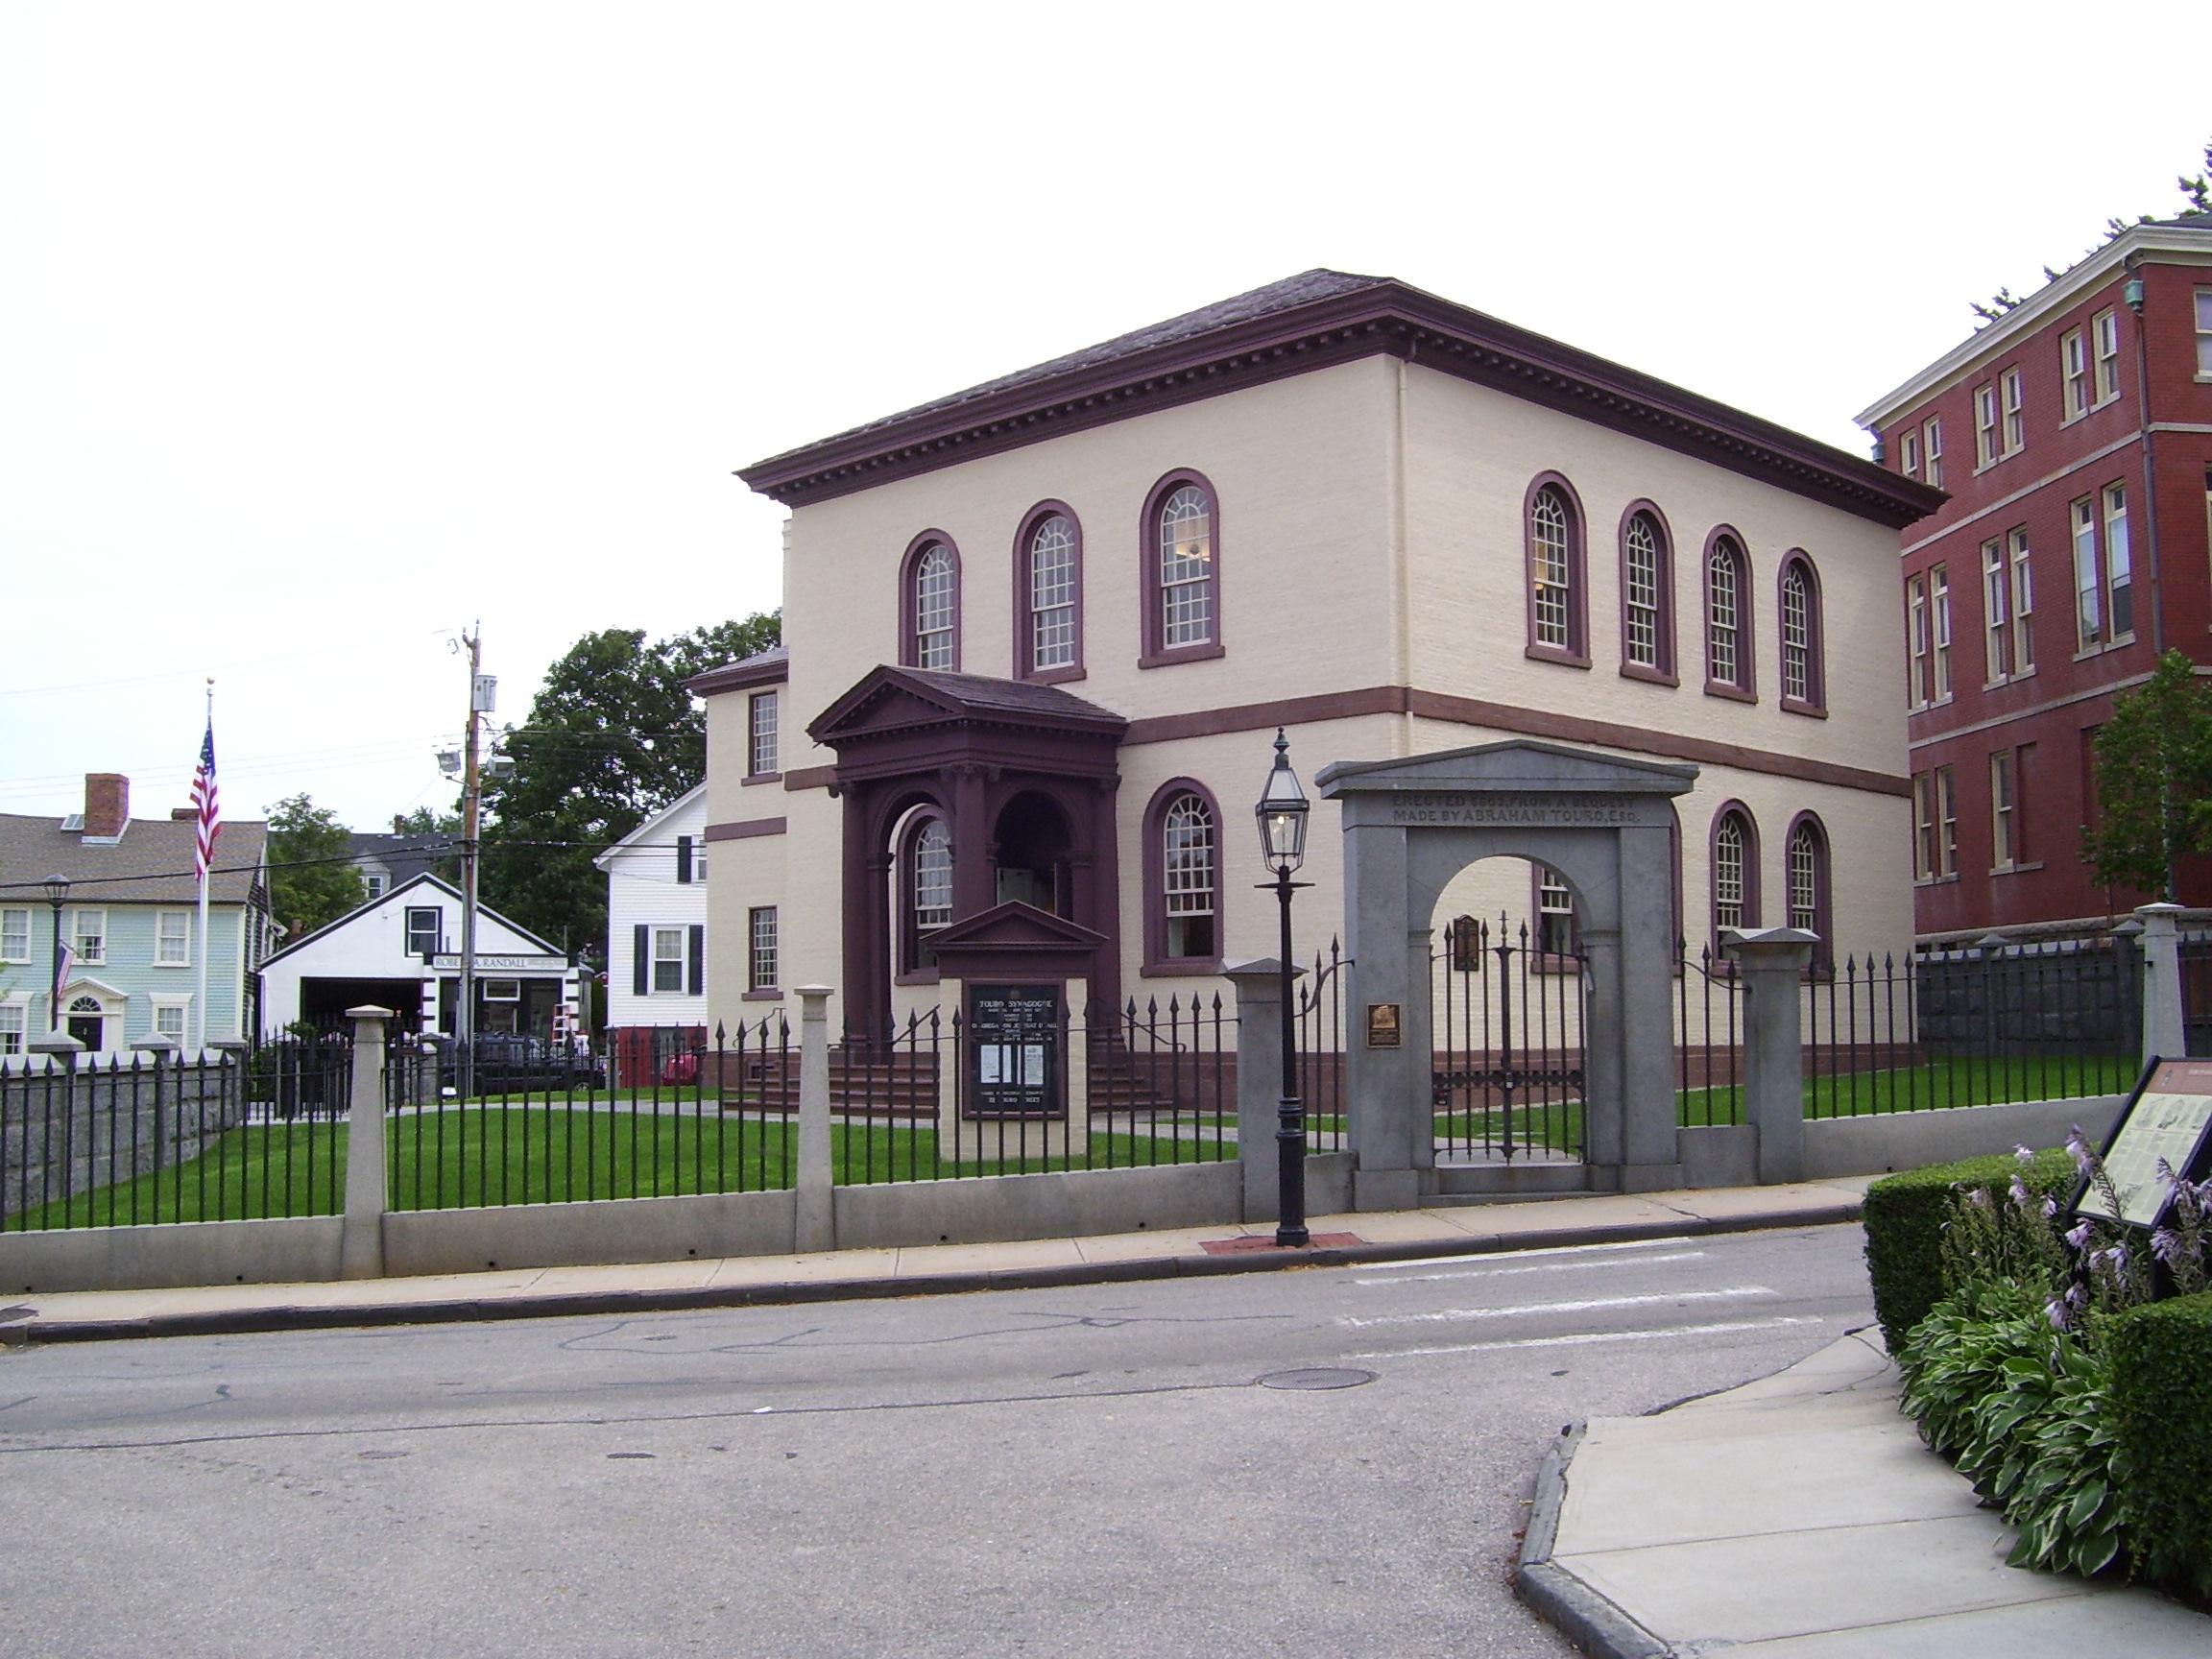 Touro_Synagogue_Newport_Rhode_Island_3.jpg